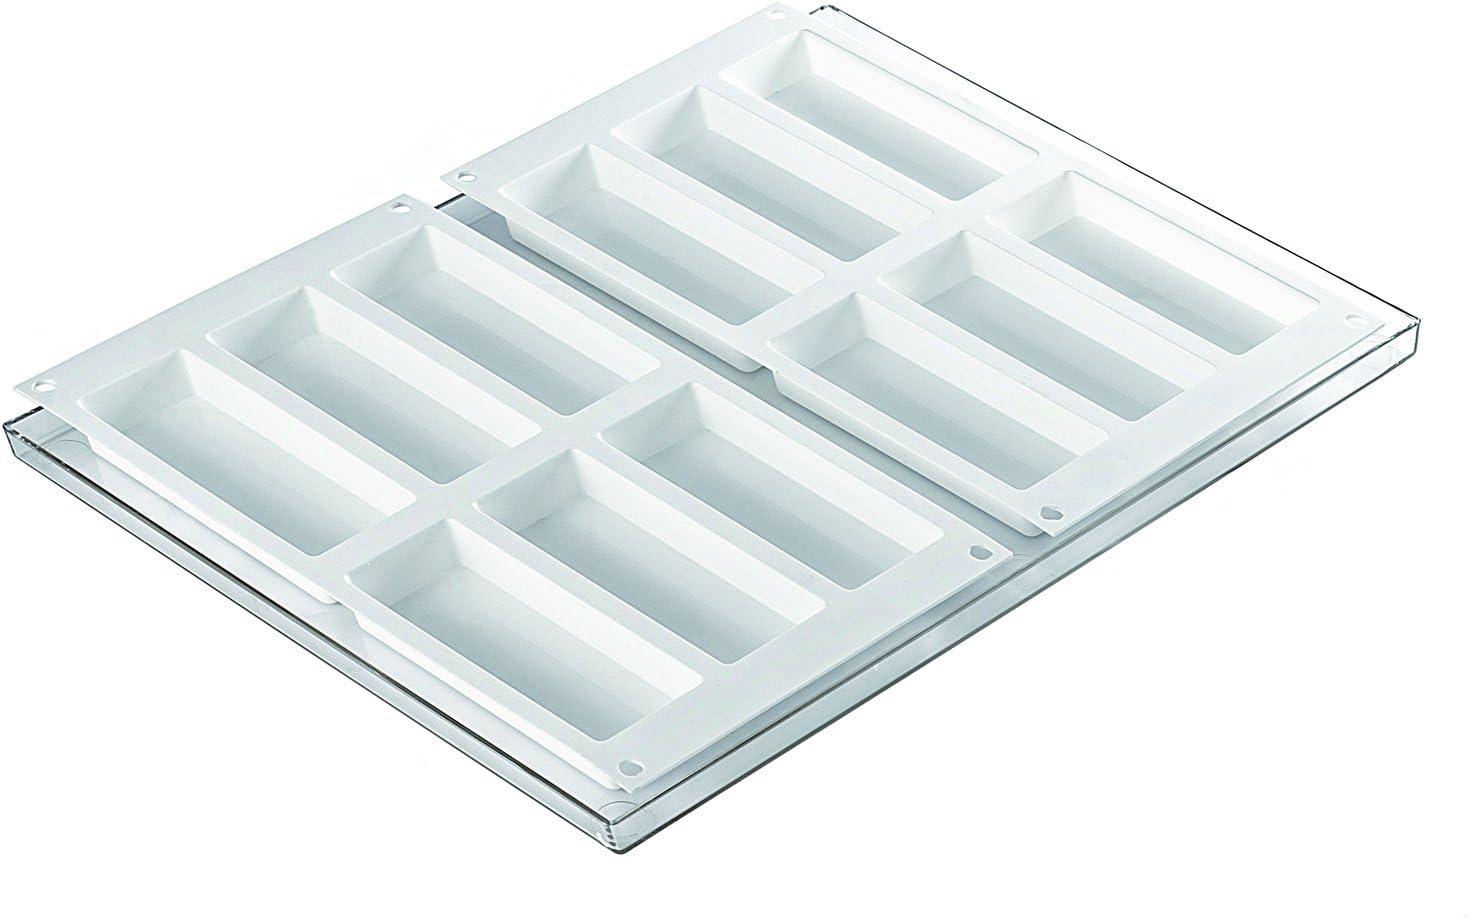 Silikomart BISC03 Ice Cream Sandwich Silicone Mold